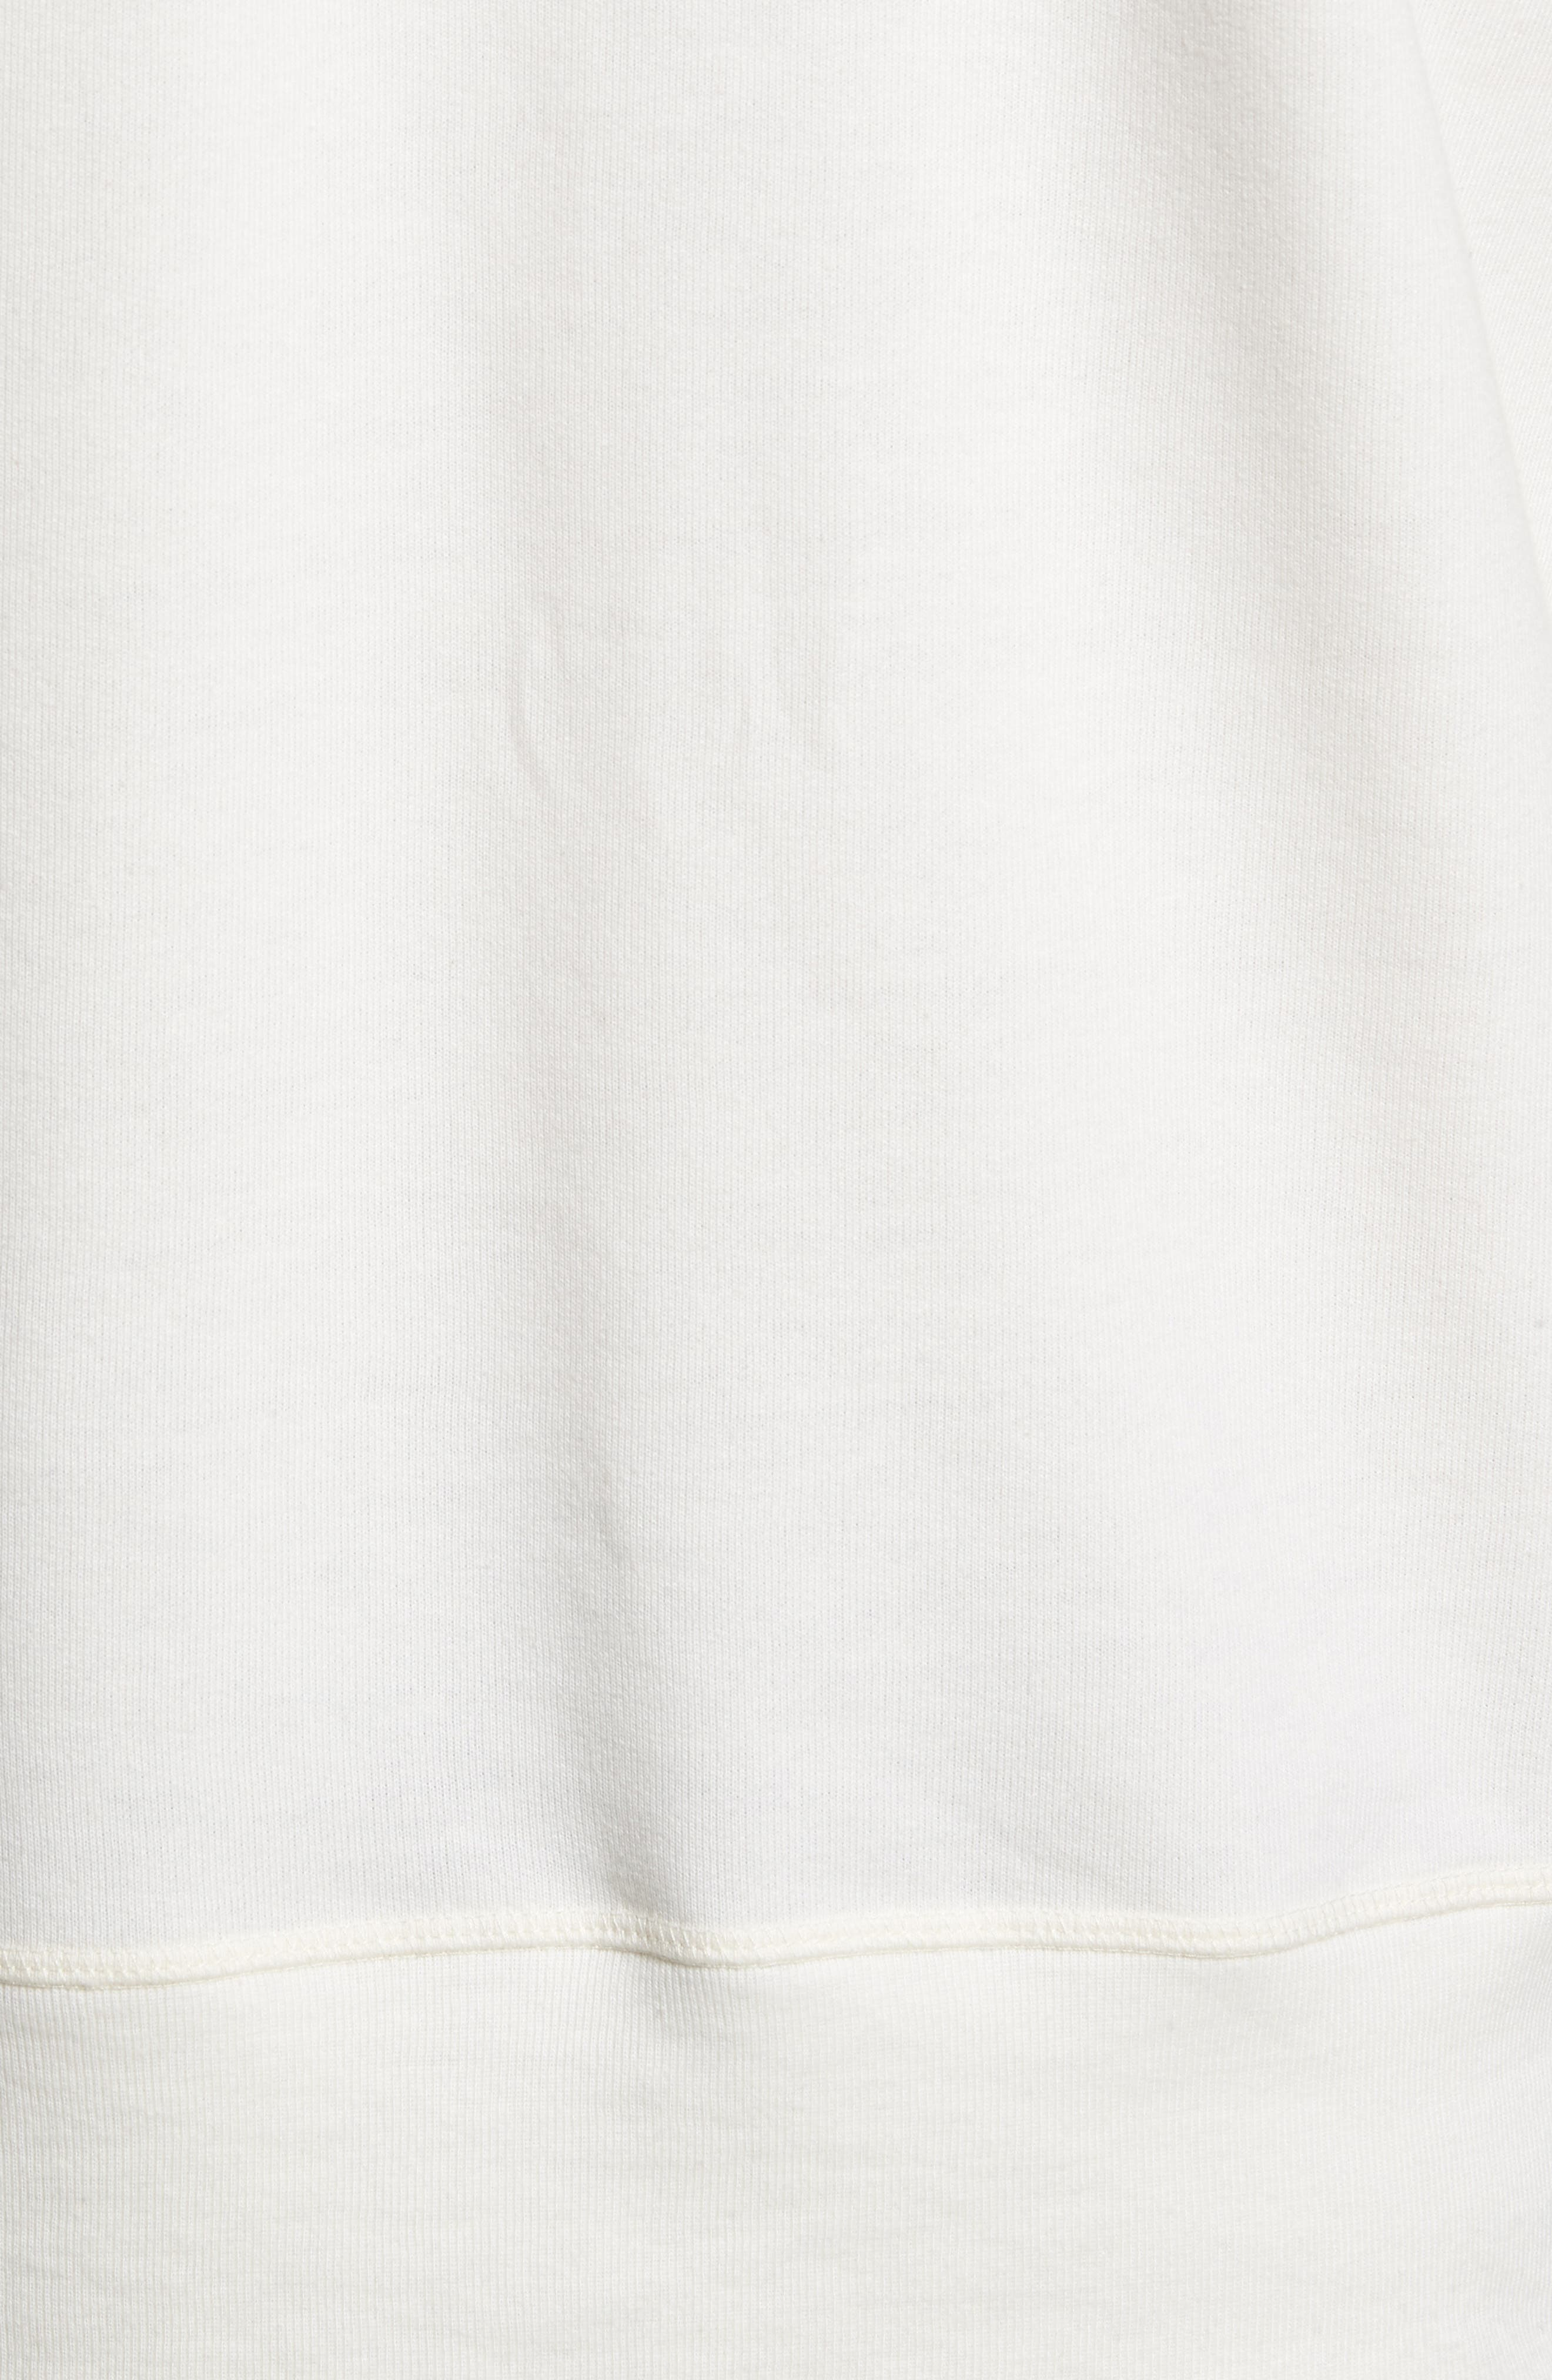 B-Side Reversible Crewneck Sweatshirt,                             Alternate thumbnail 31, color,